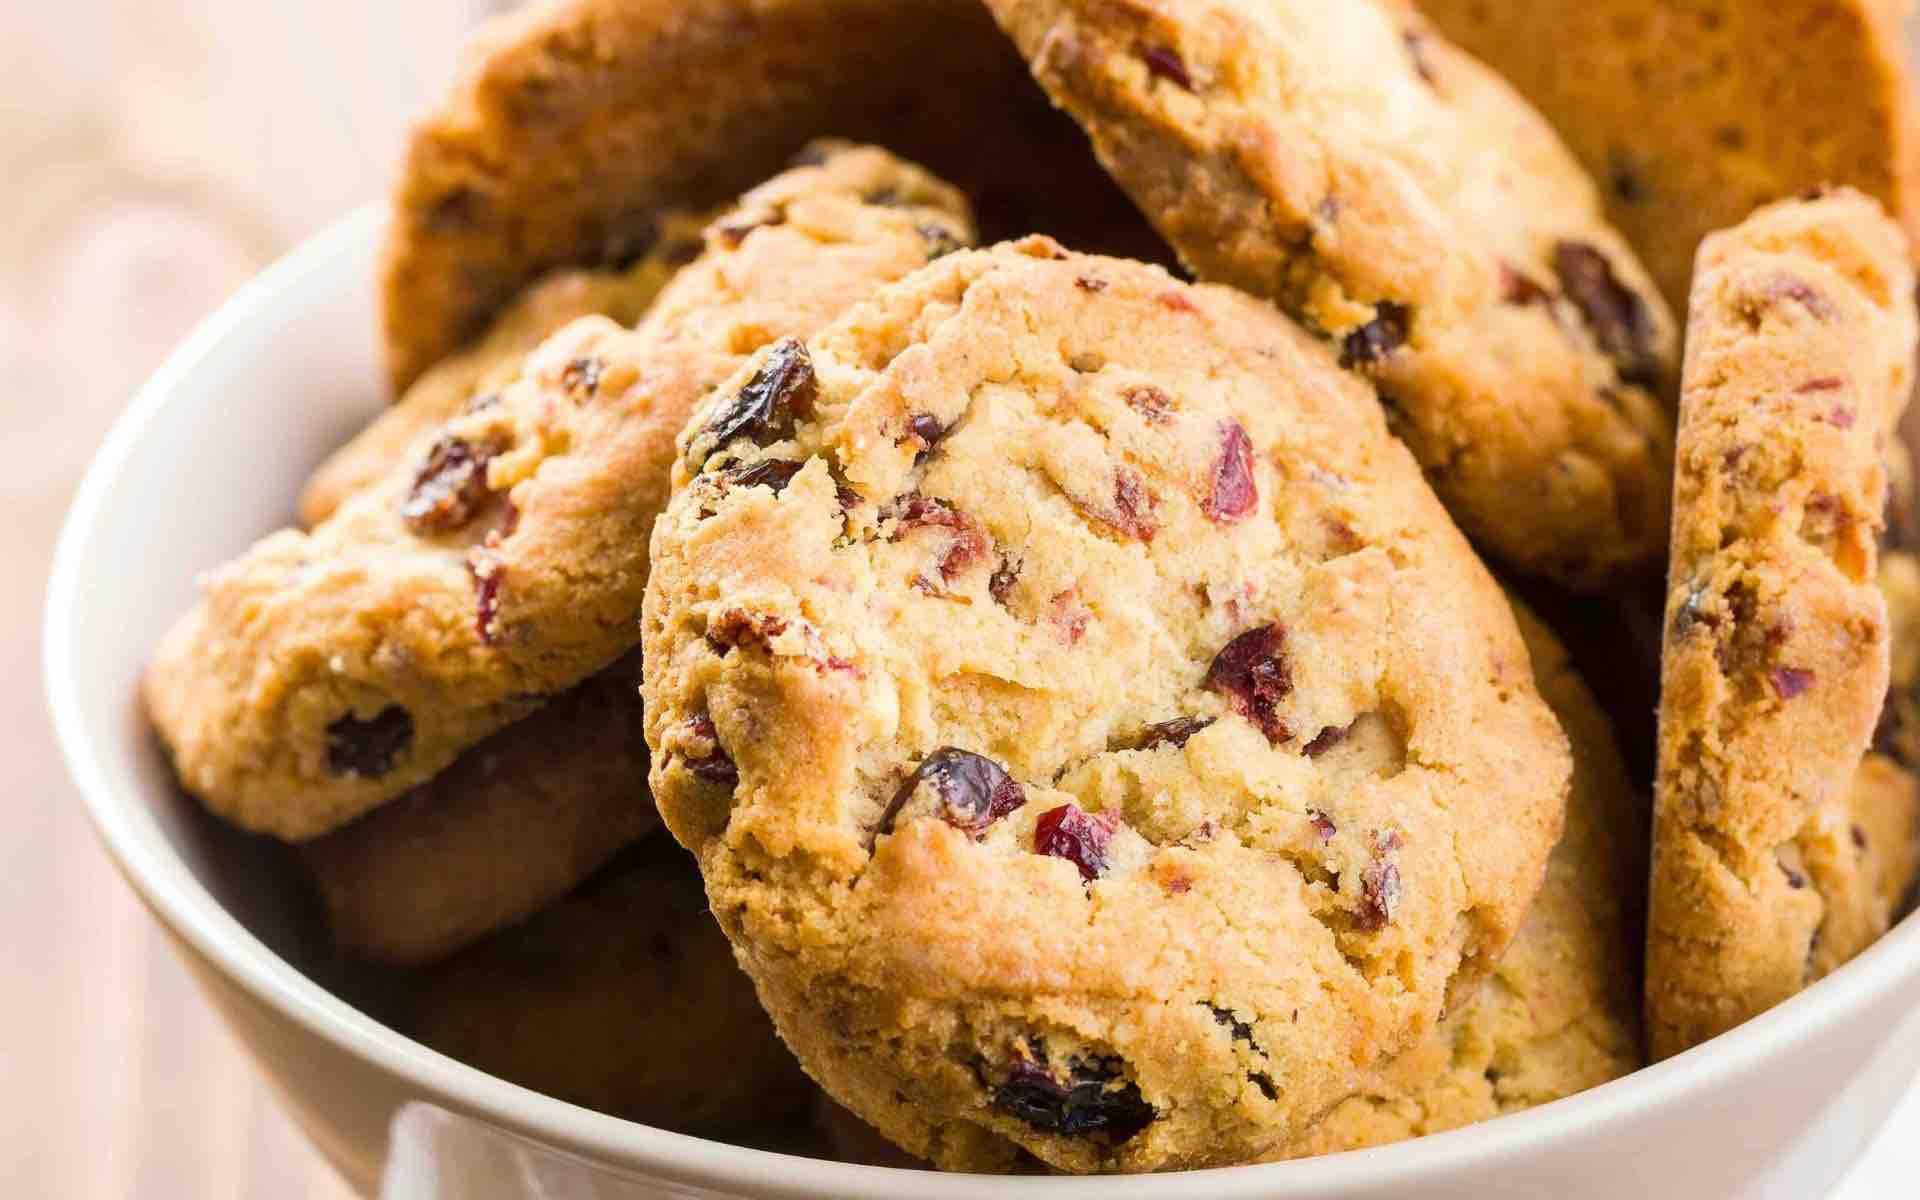 biscuits secs venitiens - ue